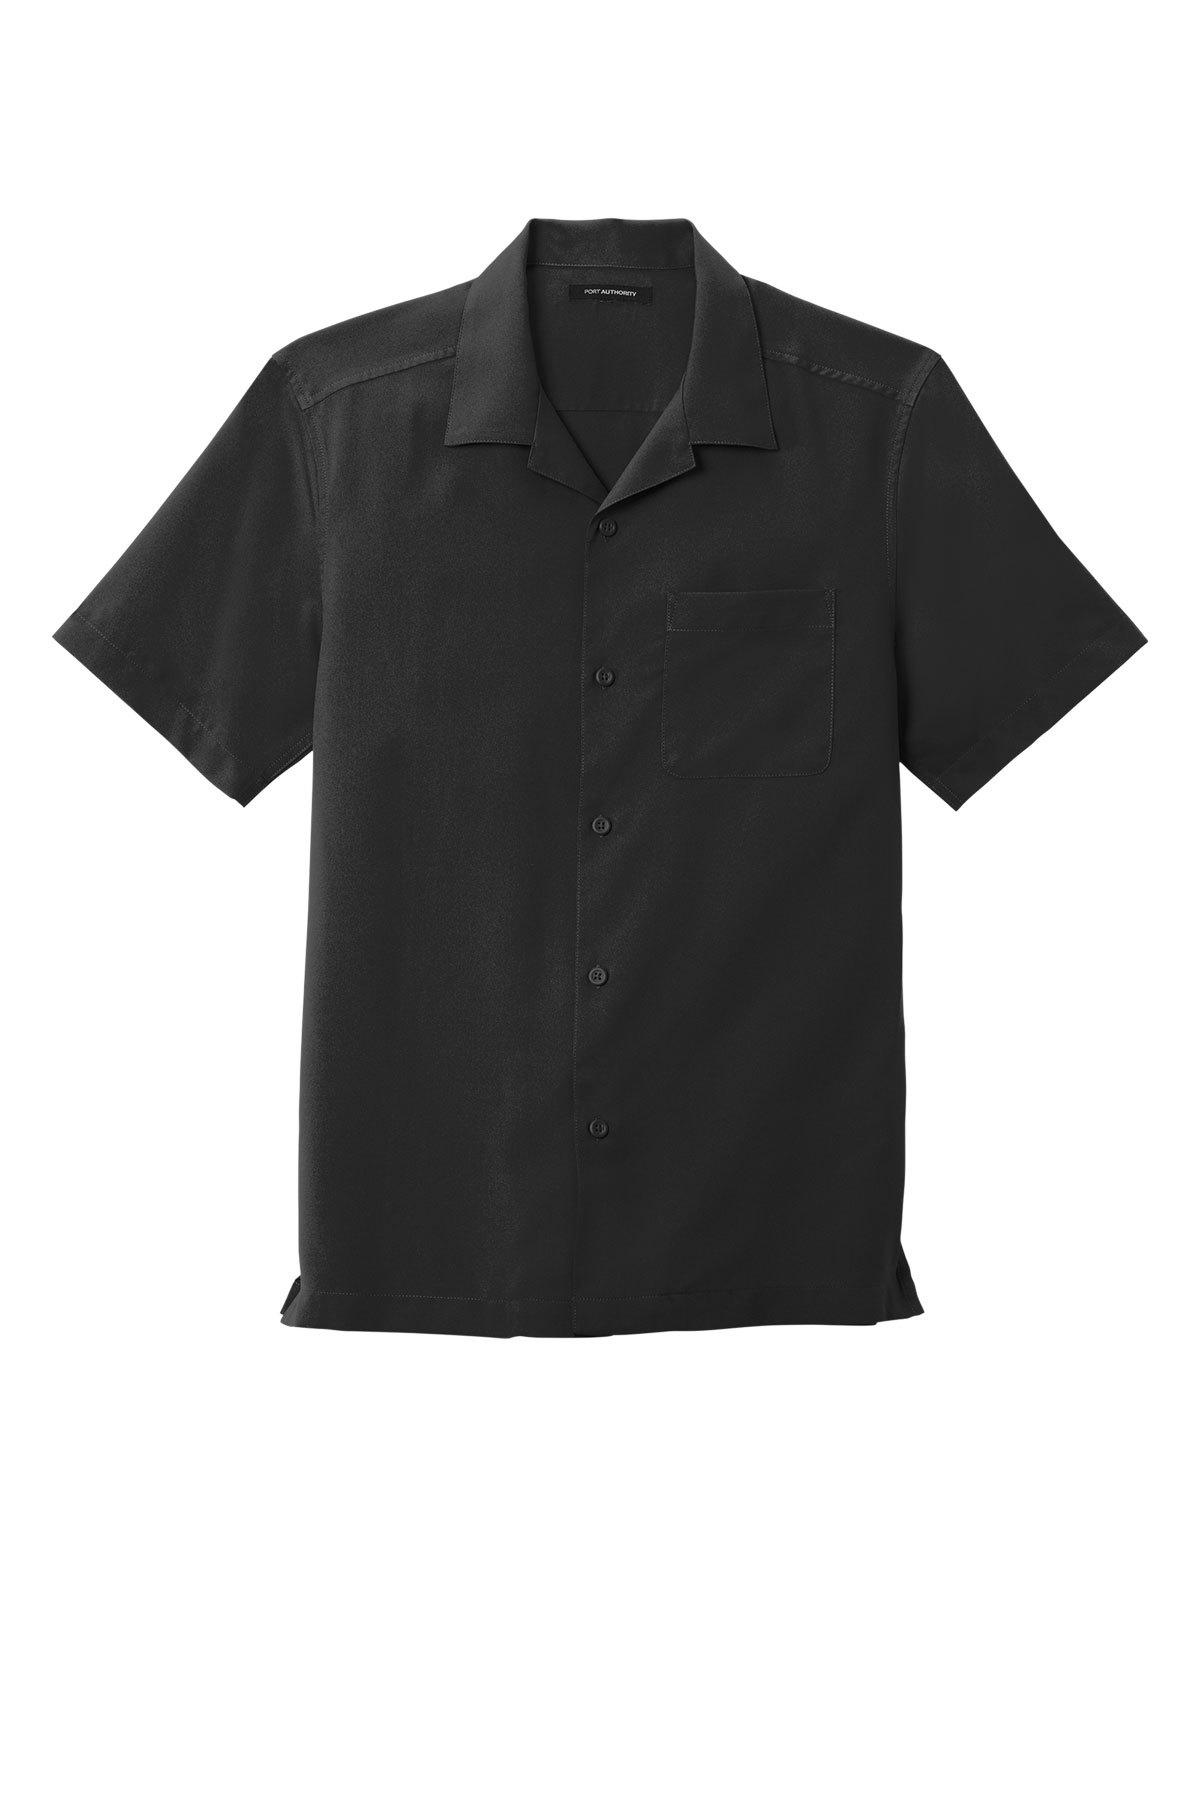 Port Authority ® W400 - Short Sleeve Performance ...